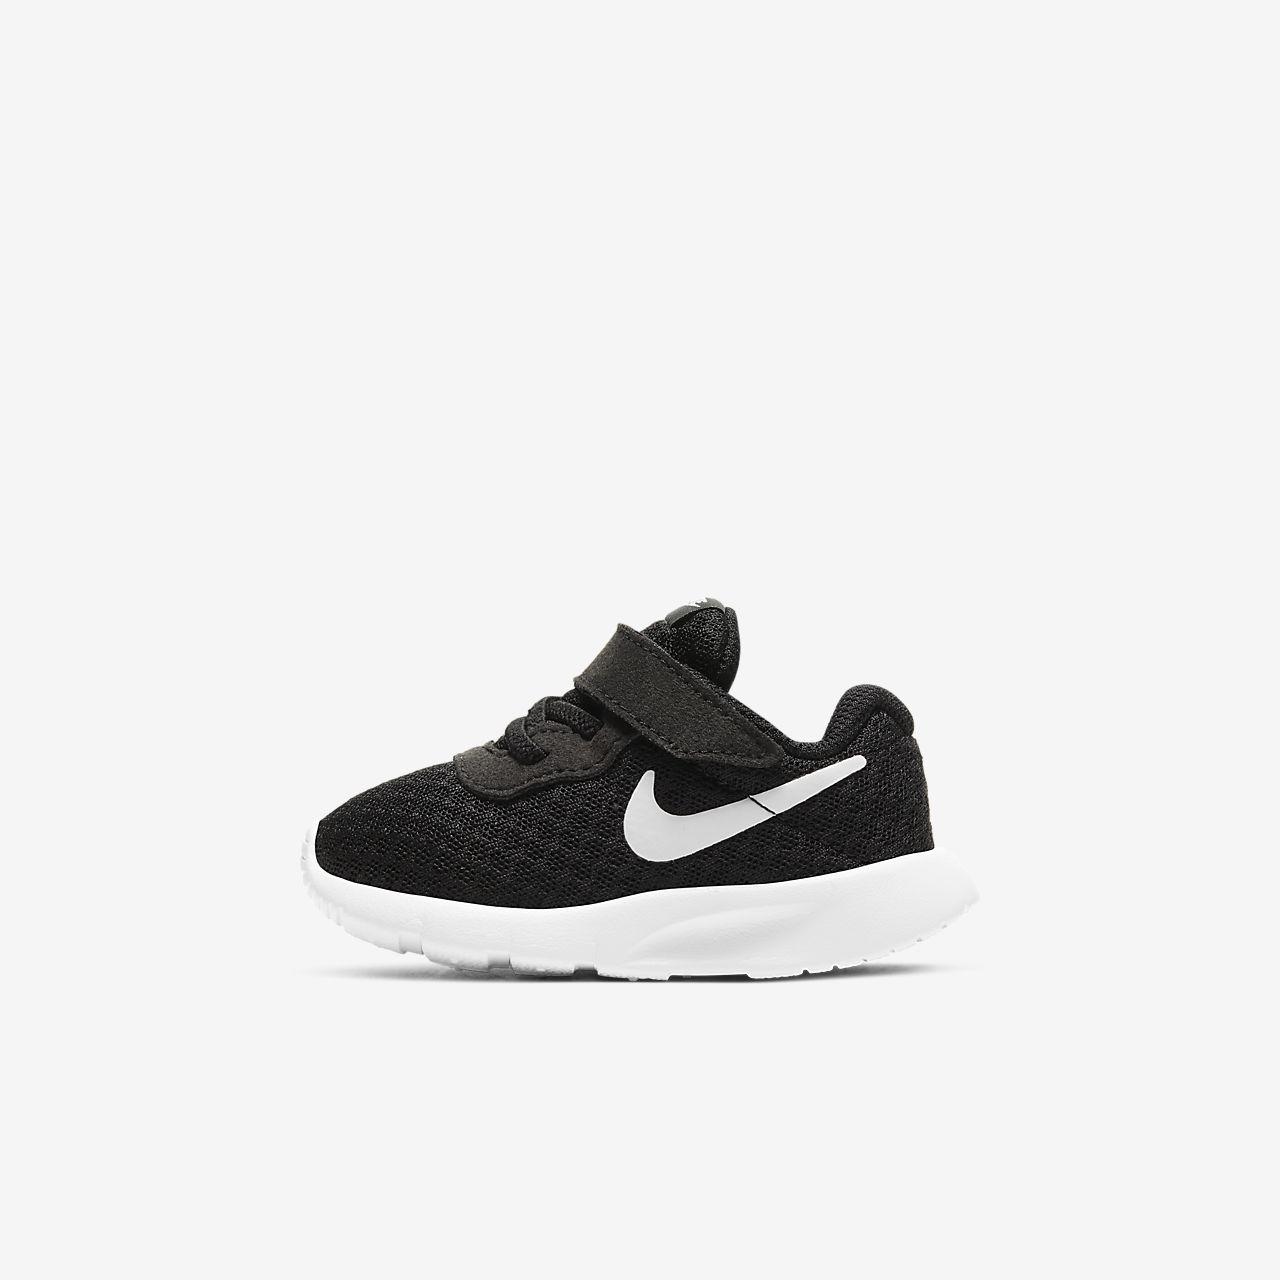 Enfant17 Nike Bébépetit Tanjun Chaussure Pour 27Fr lc3F1TuJK5